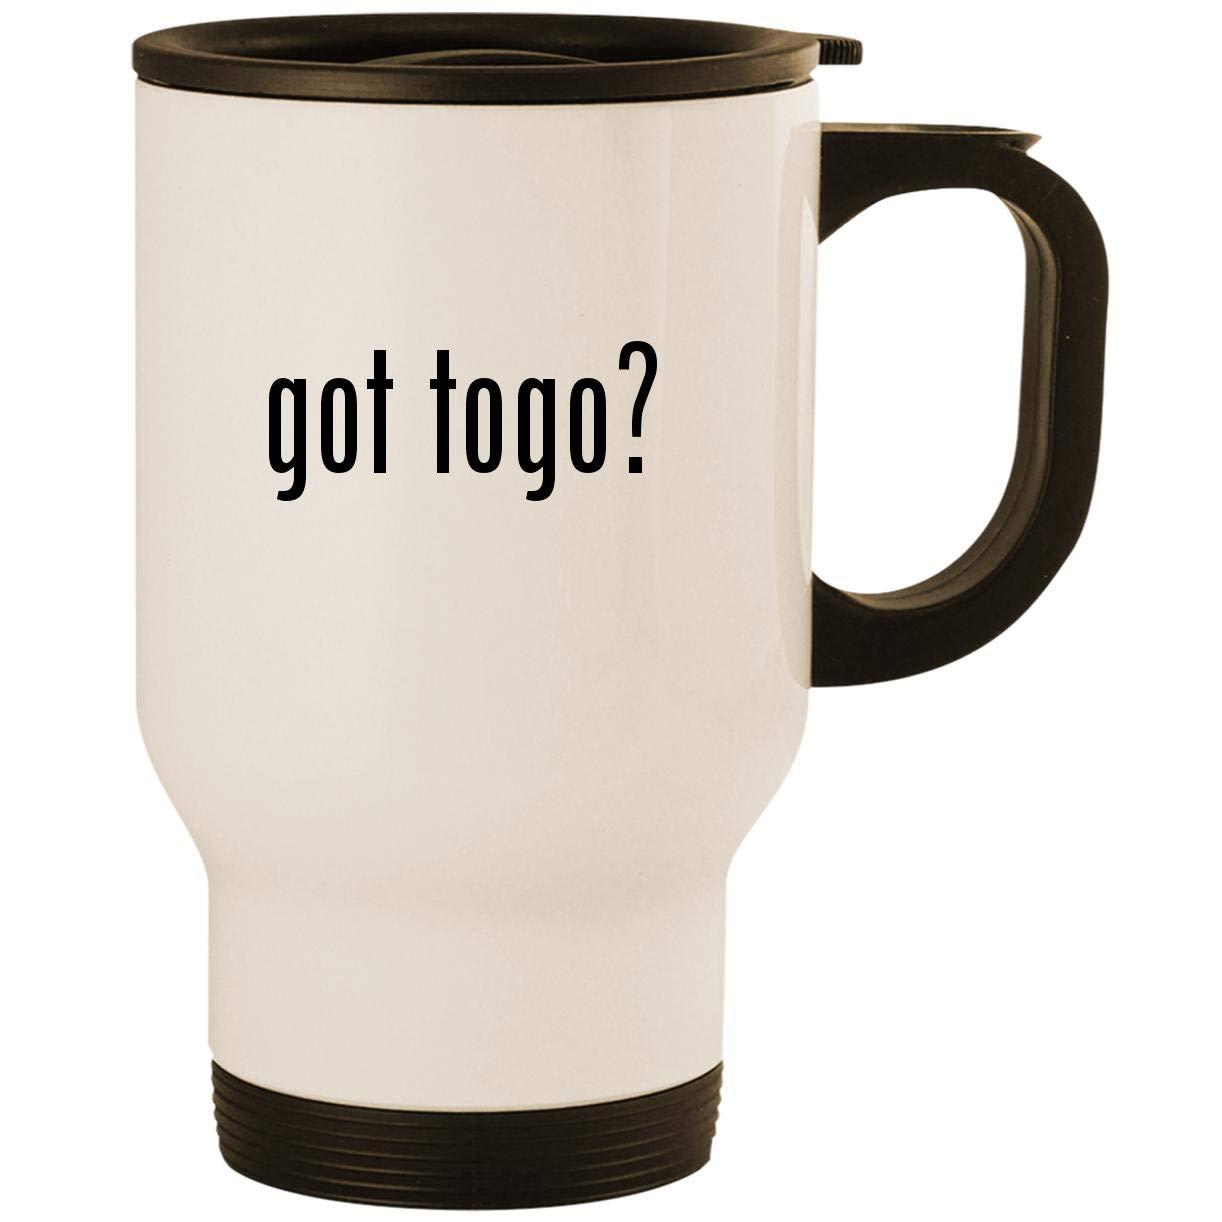 got togo? - Stainless Steel 14oz Road Ready Travel Mug, White